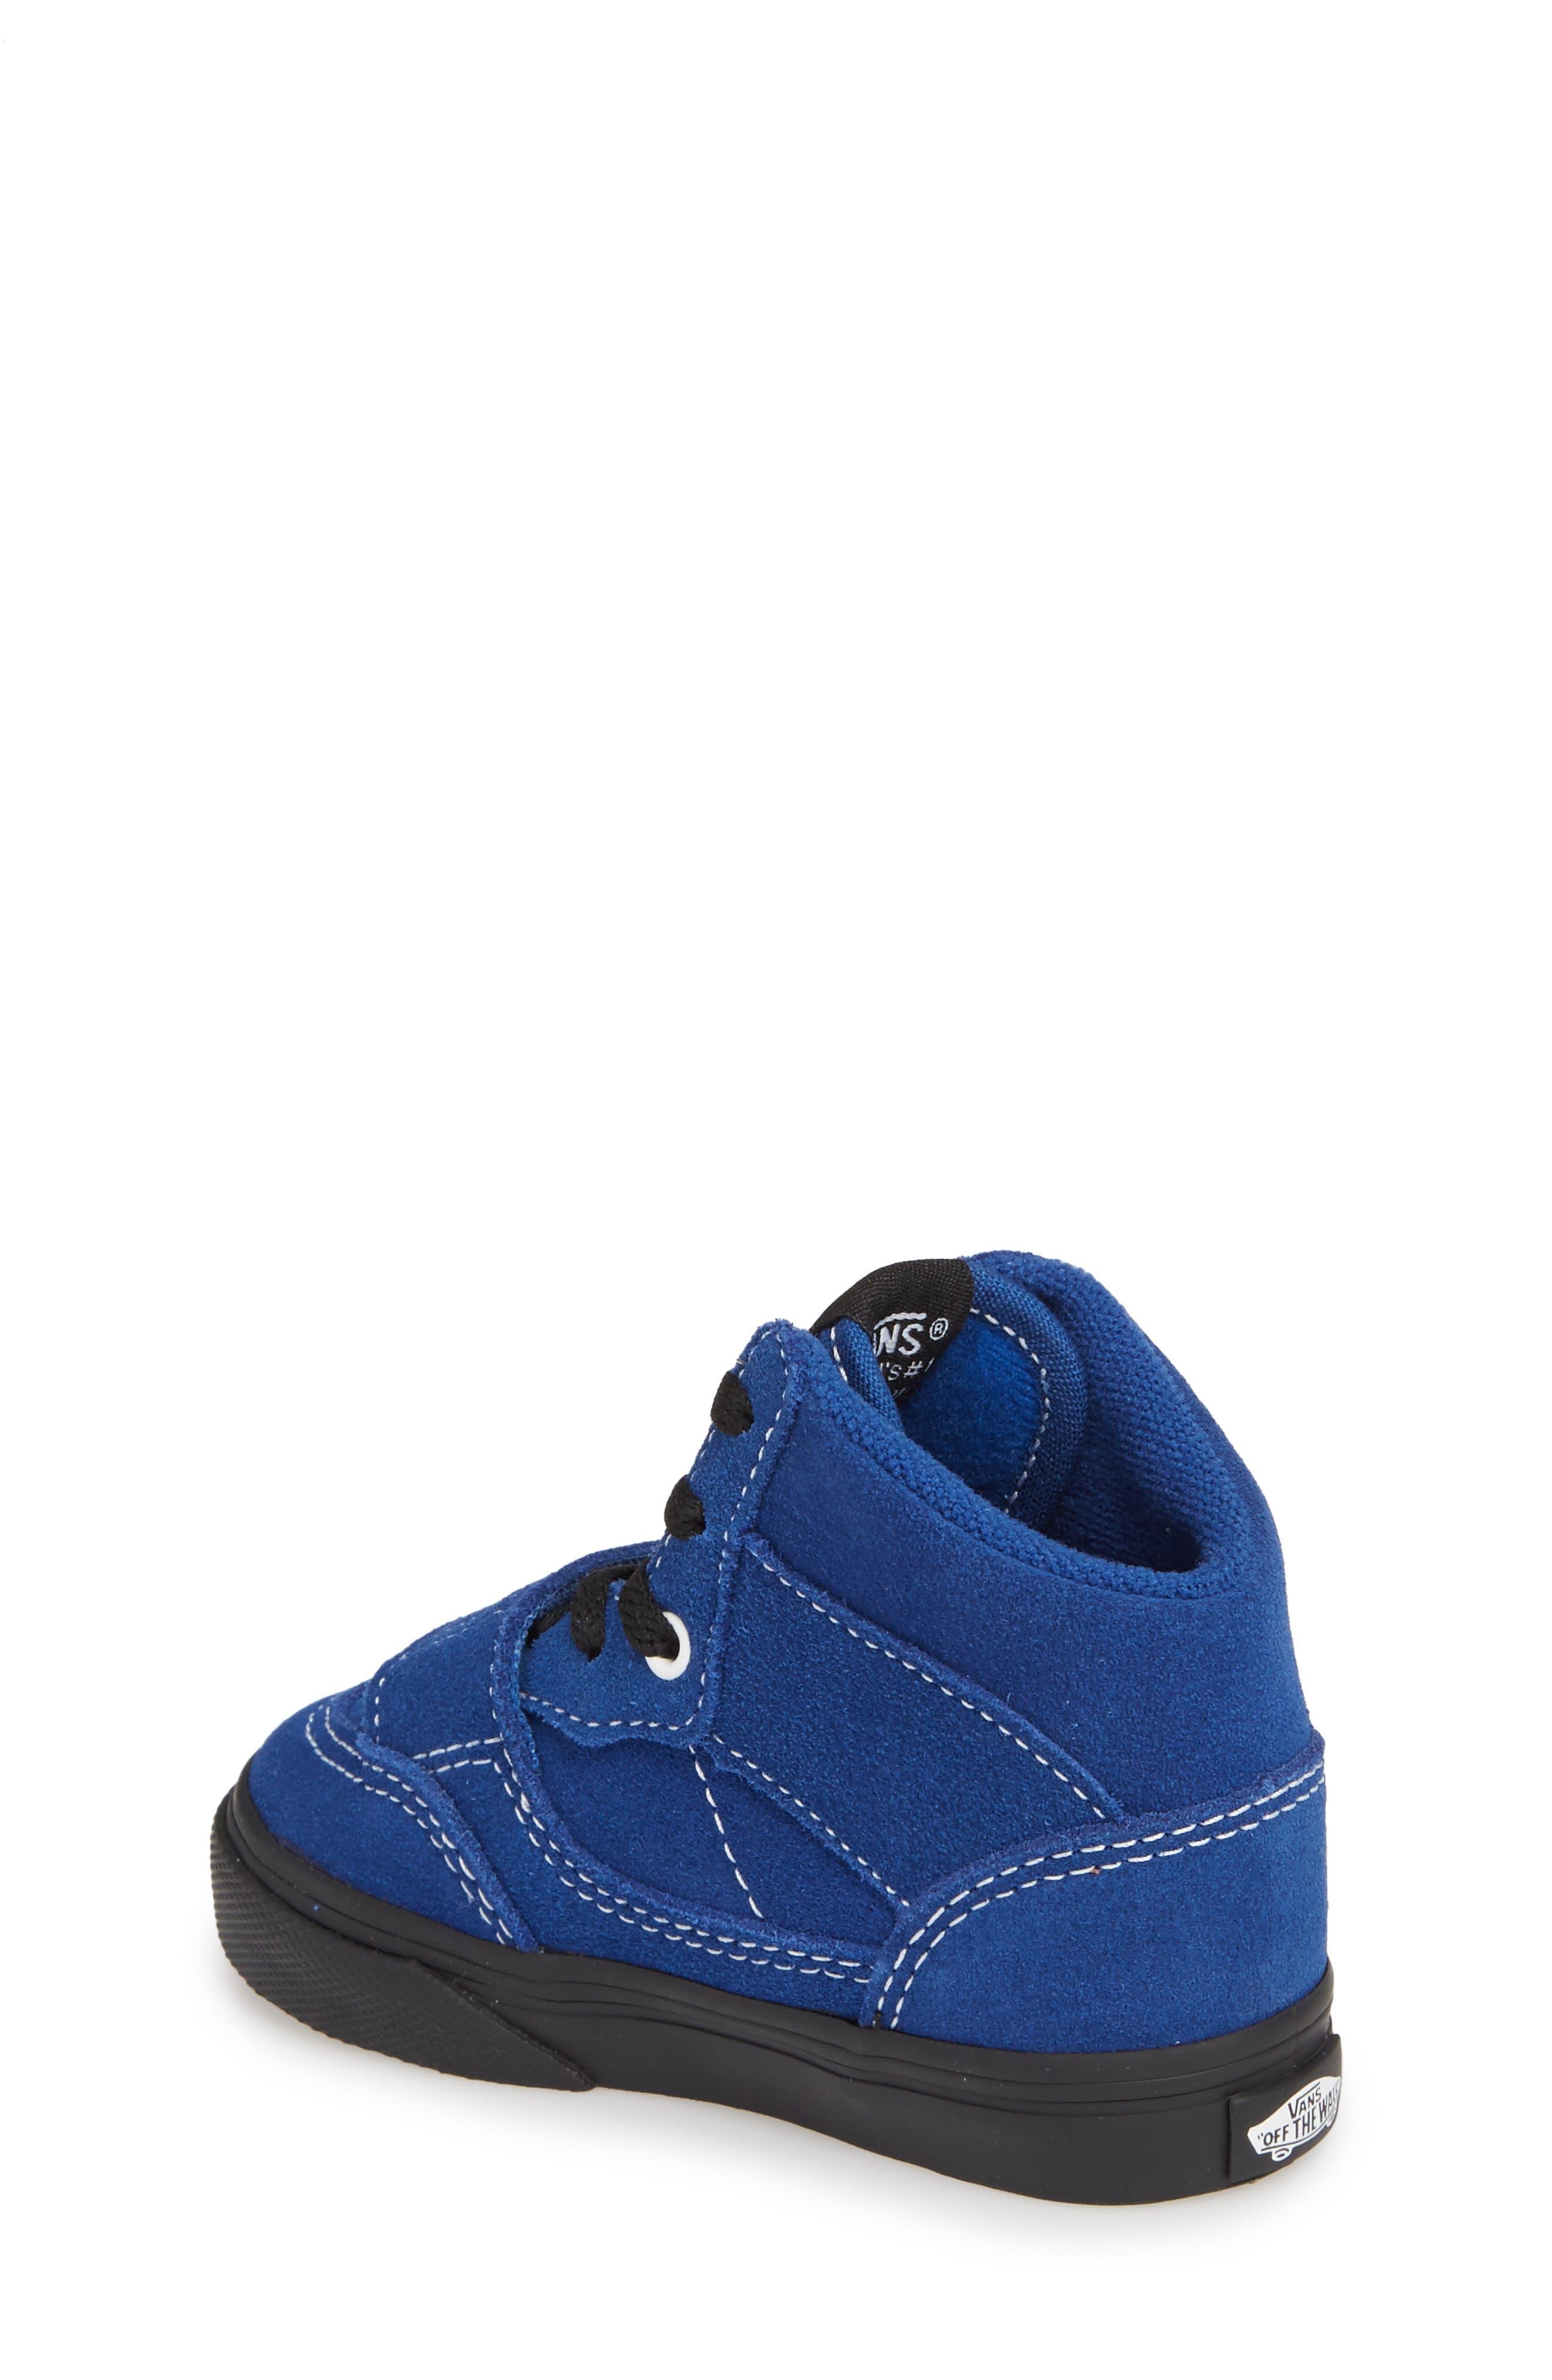 Mountain Edition Mid Top Sneaker,                             Alternate thumbnail 2, color,                             Blue/ Black